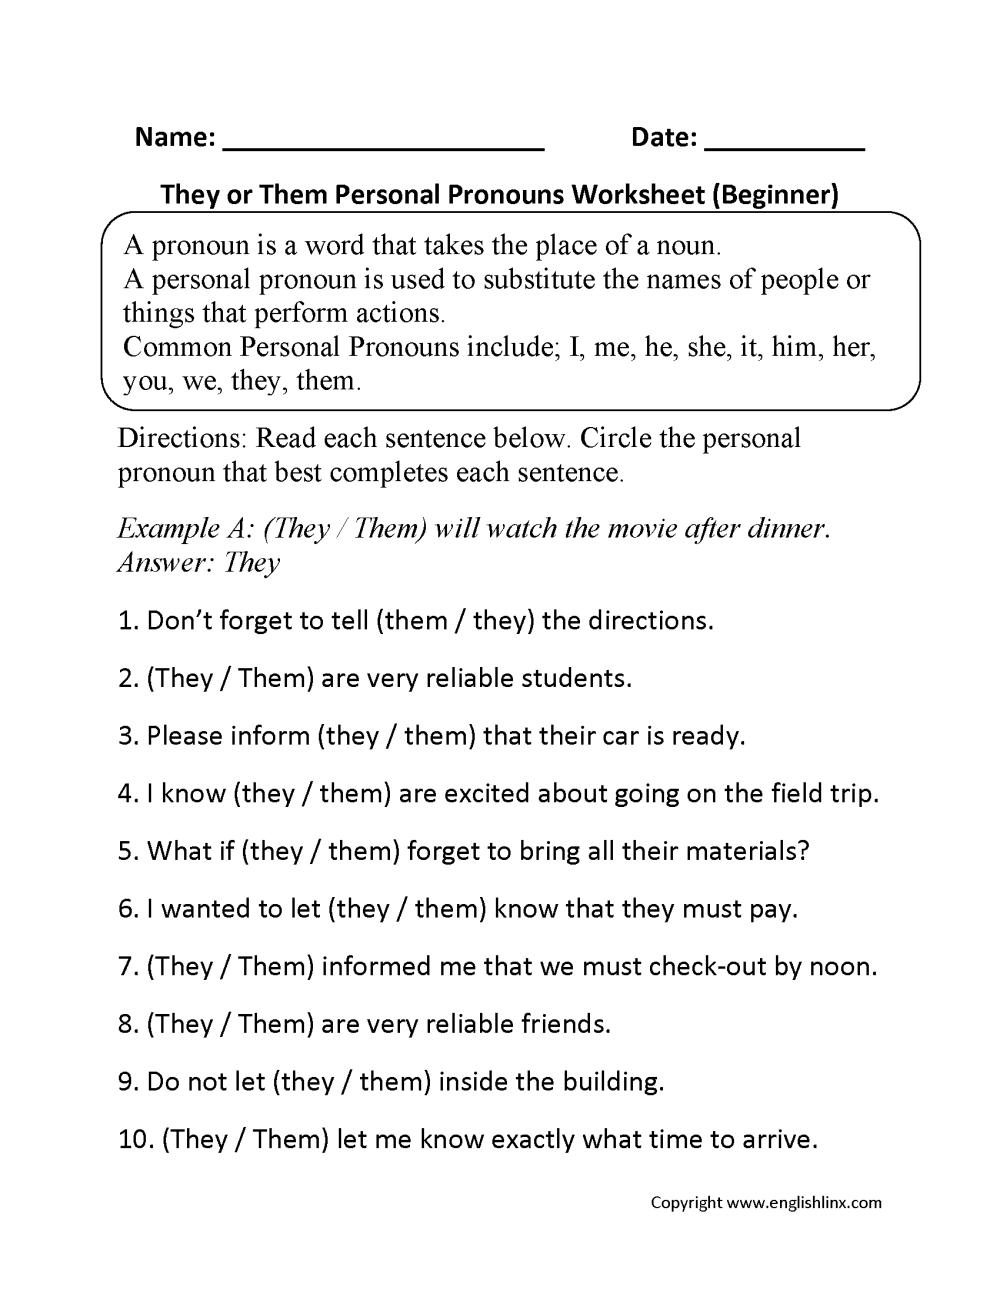 medium resolution of Personal Pronouns Worksheets   They or Them Personal Pronouns Worksheets  Beginner